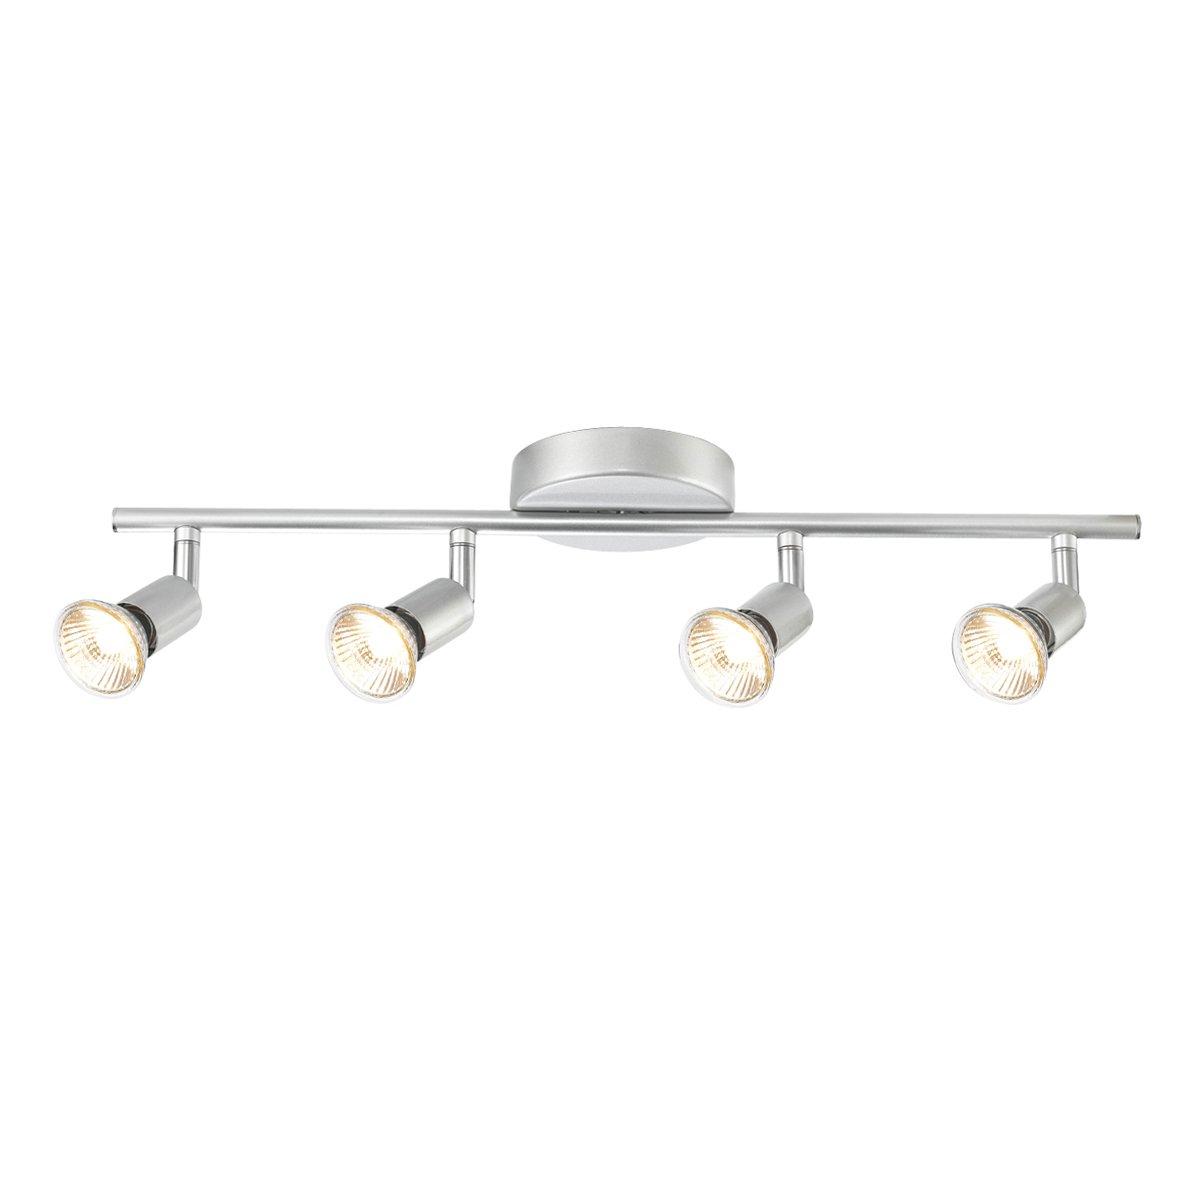 Best rated in complete track lighting kits helpful customer globe electric payton 4 light adjustable track lighting kit matte silver finish 58932 arubaitofo Choice Image